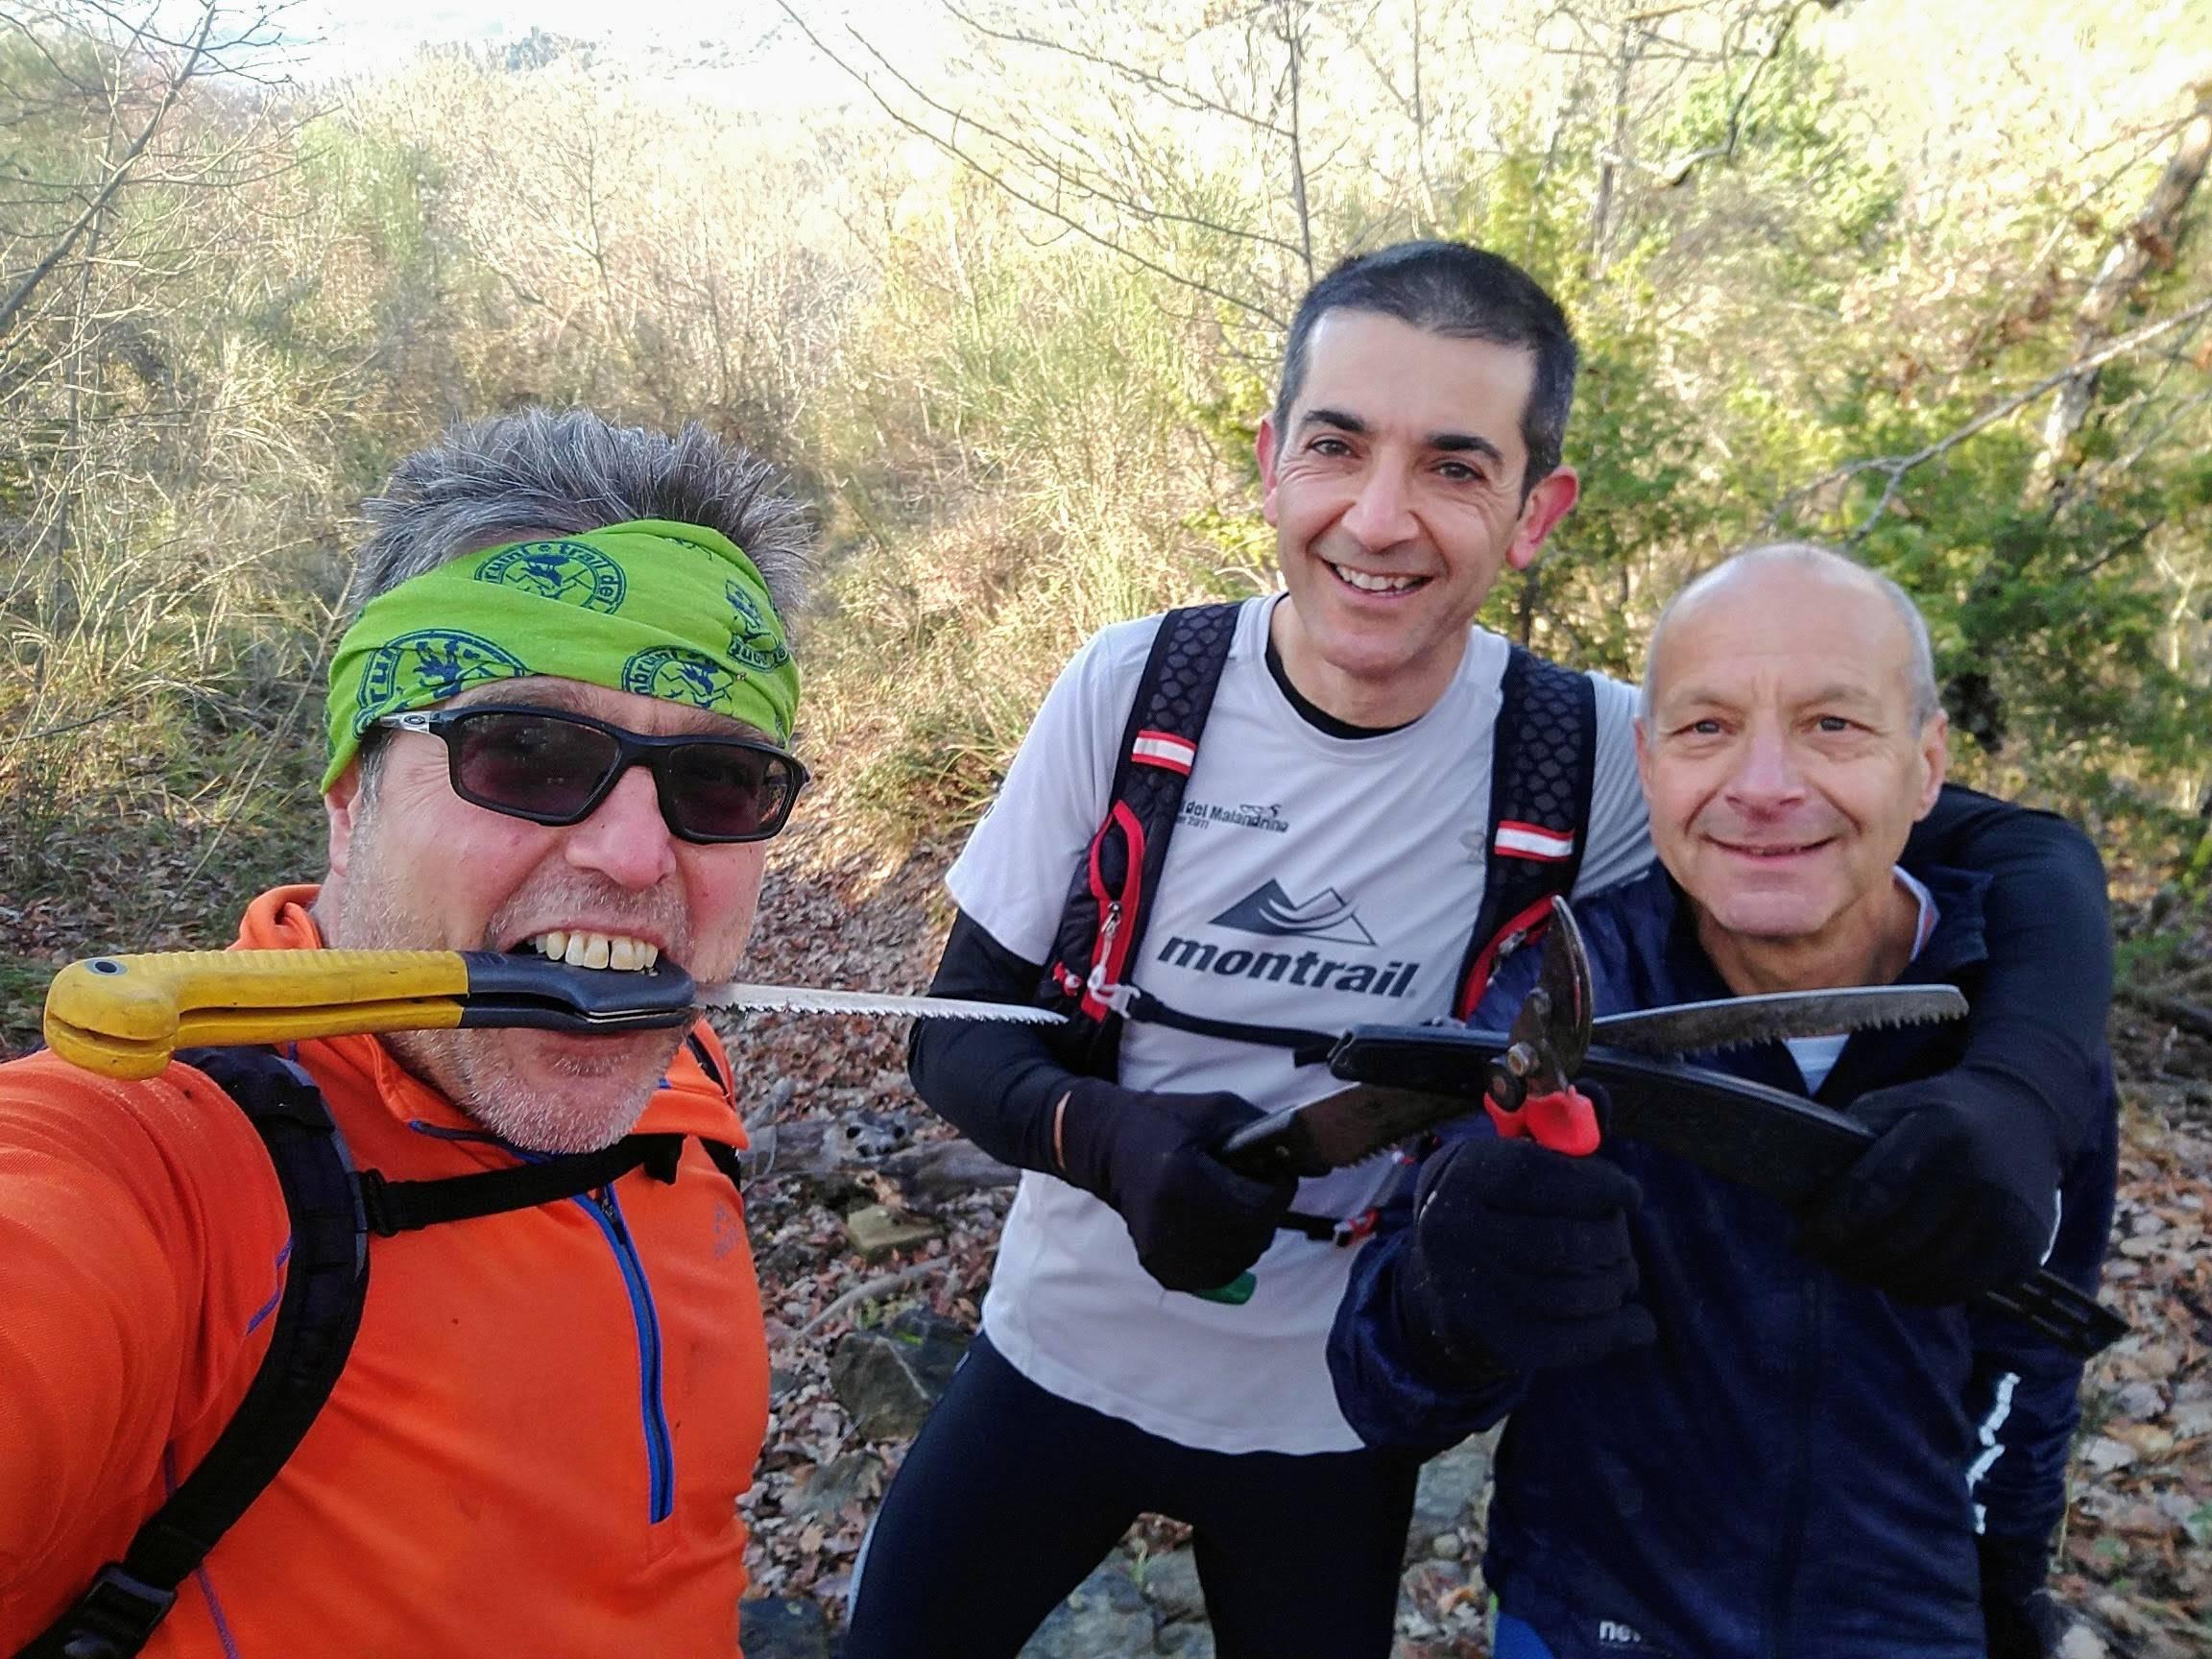 6° Querceto Trail - Test Track